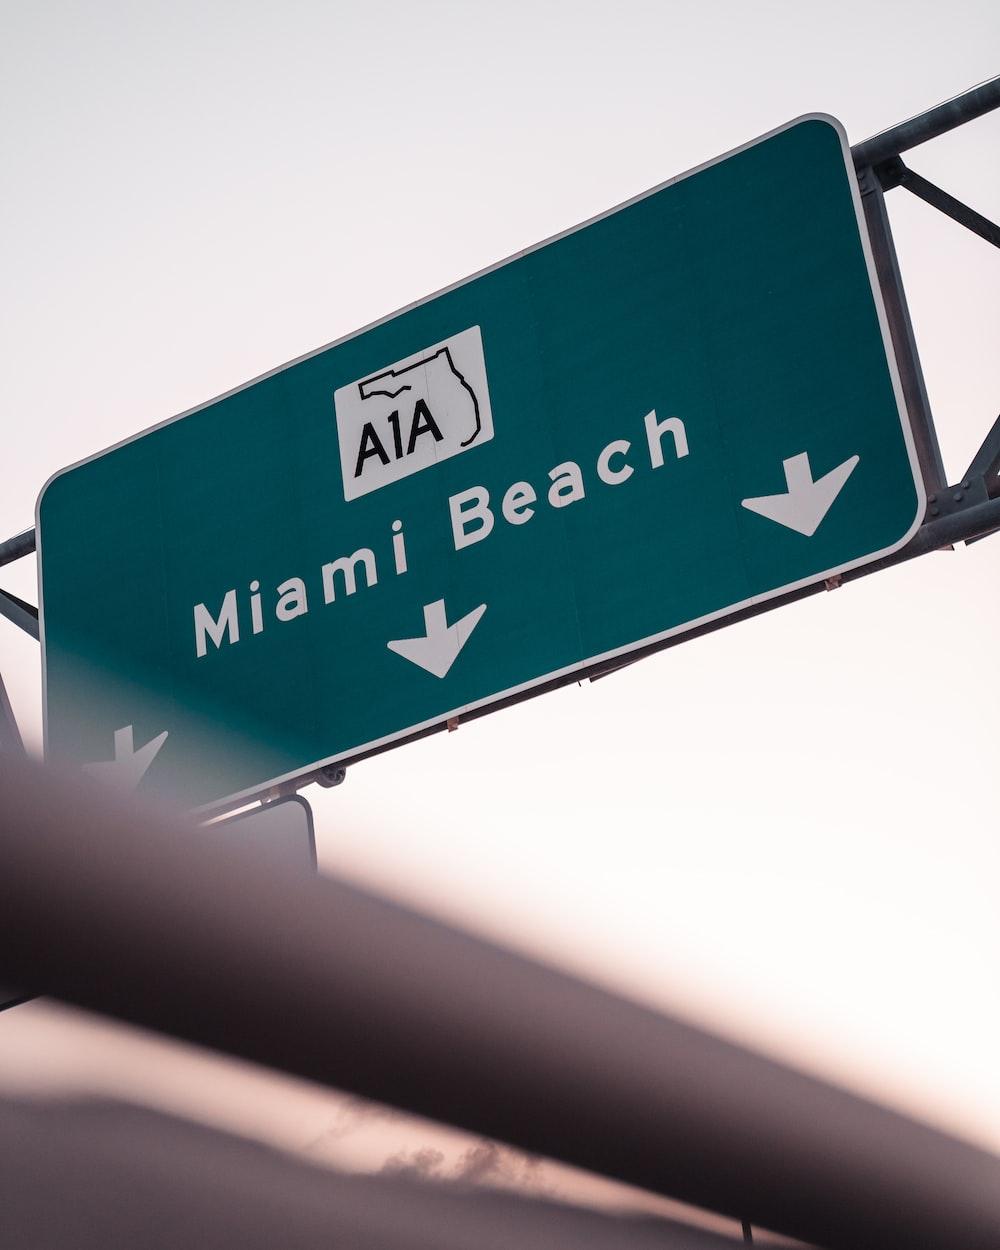 A1A Miami Beach sign